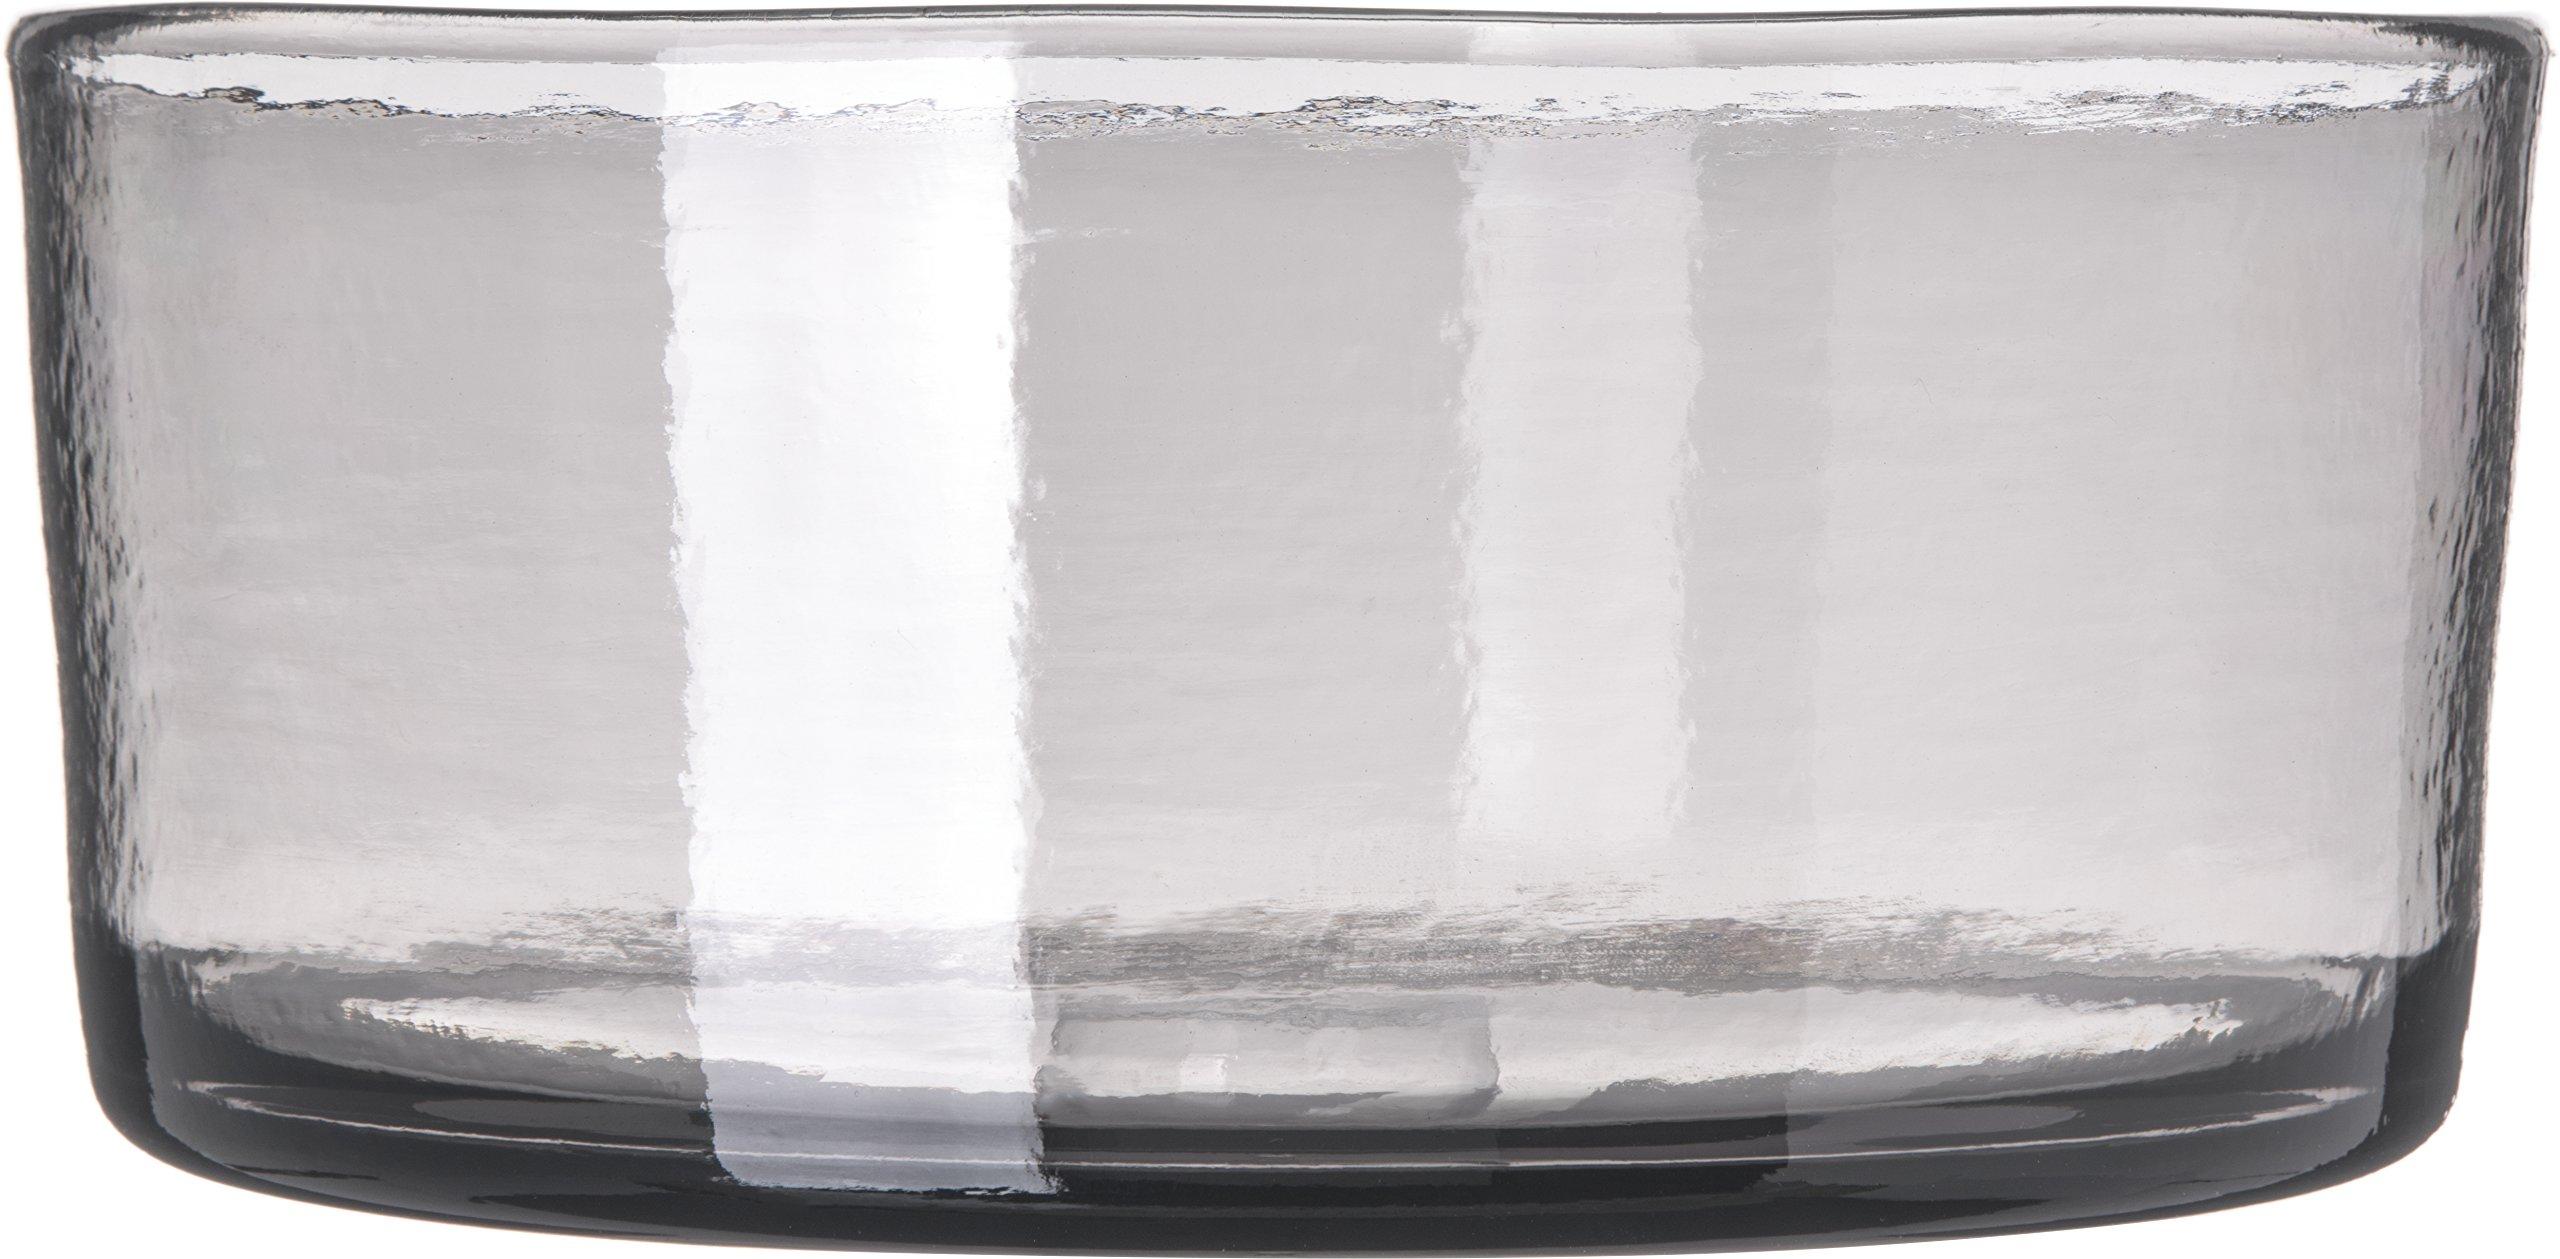 Carlisle MIN544618 Mingle Serving Bowl, 10'', Tritan, Smoke (Pack of 4) by Carlisle (Image #3)